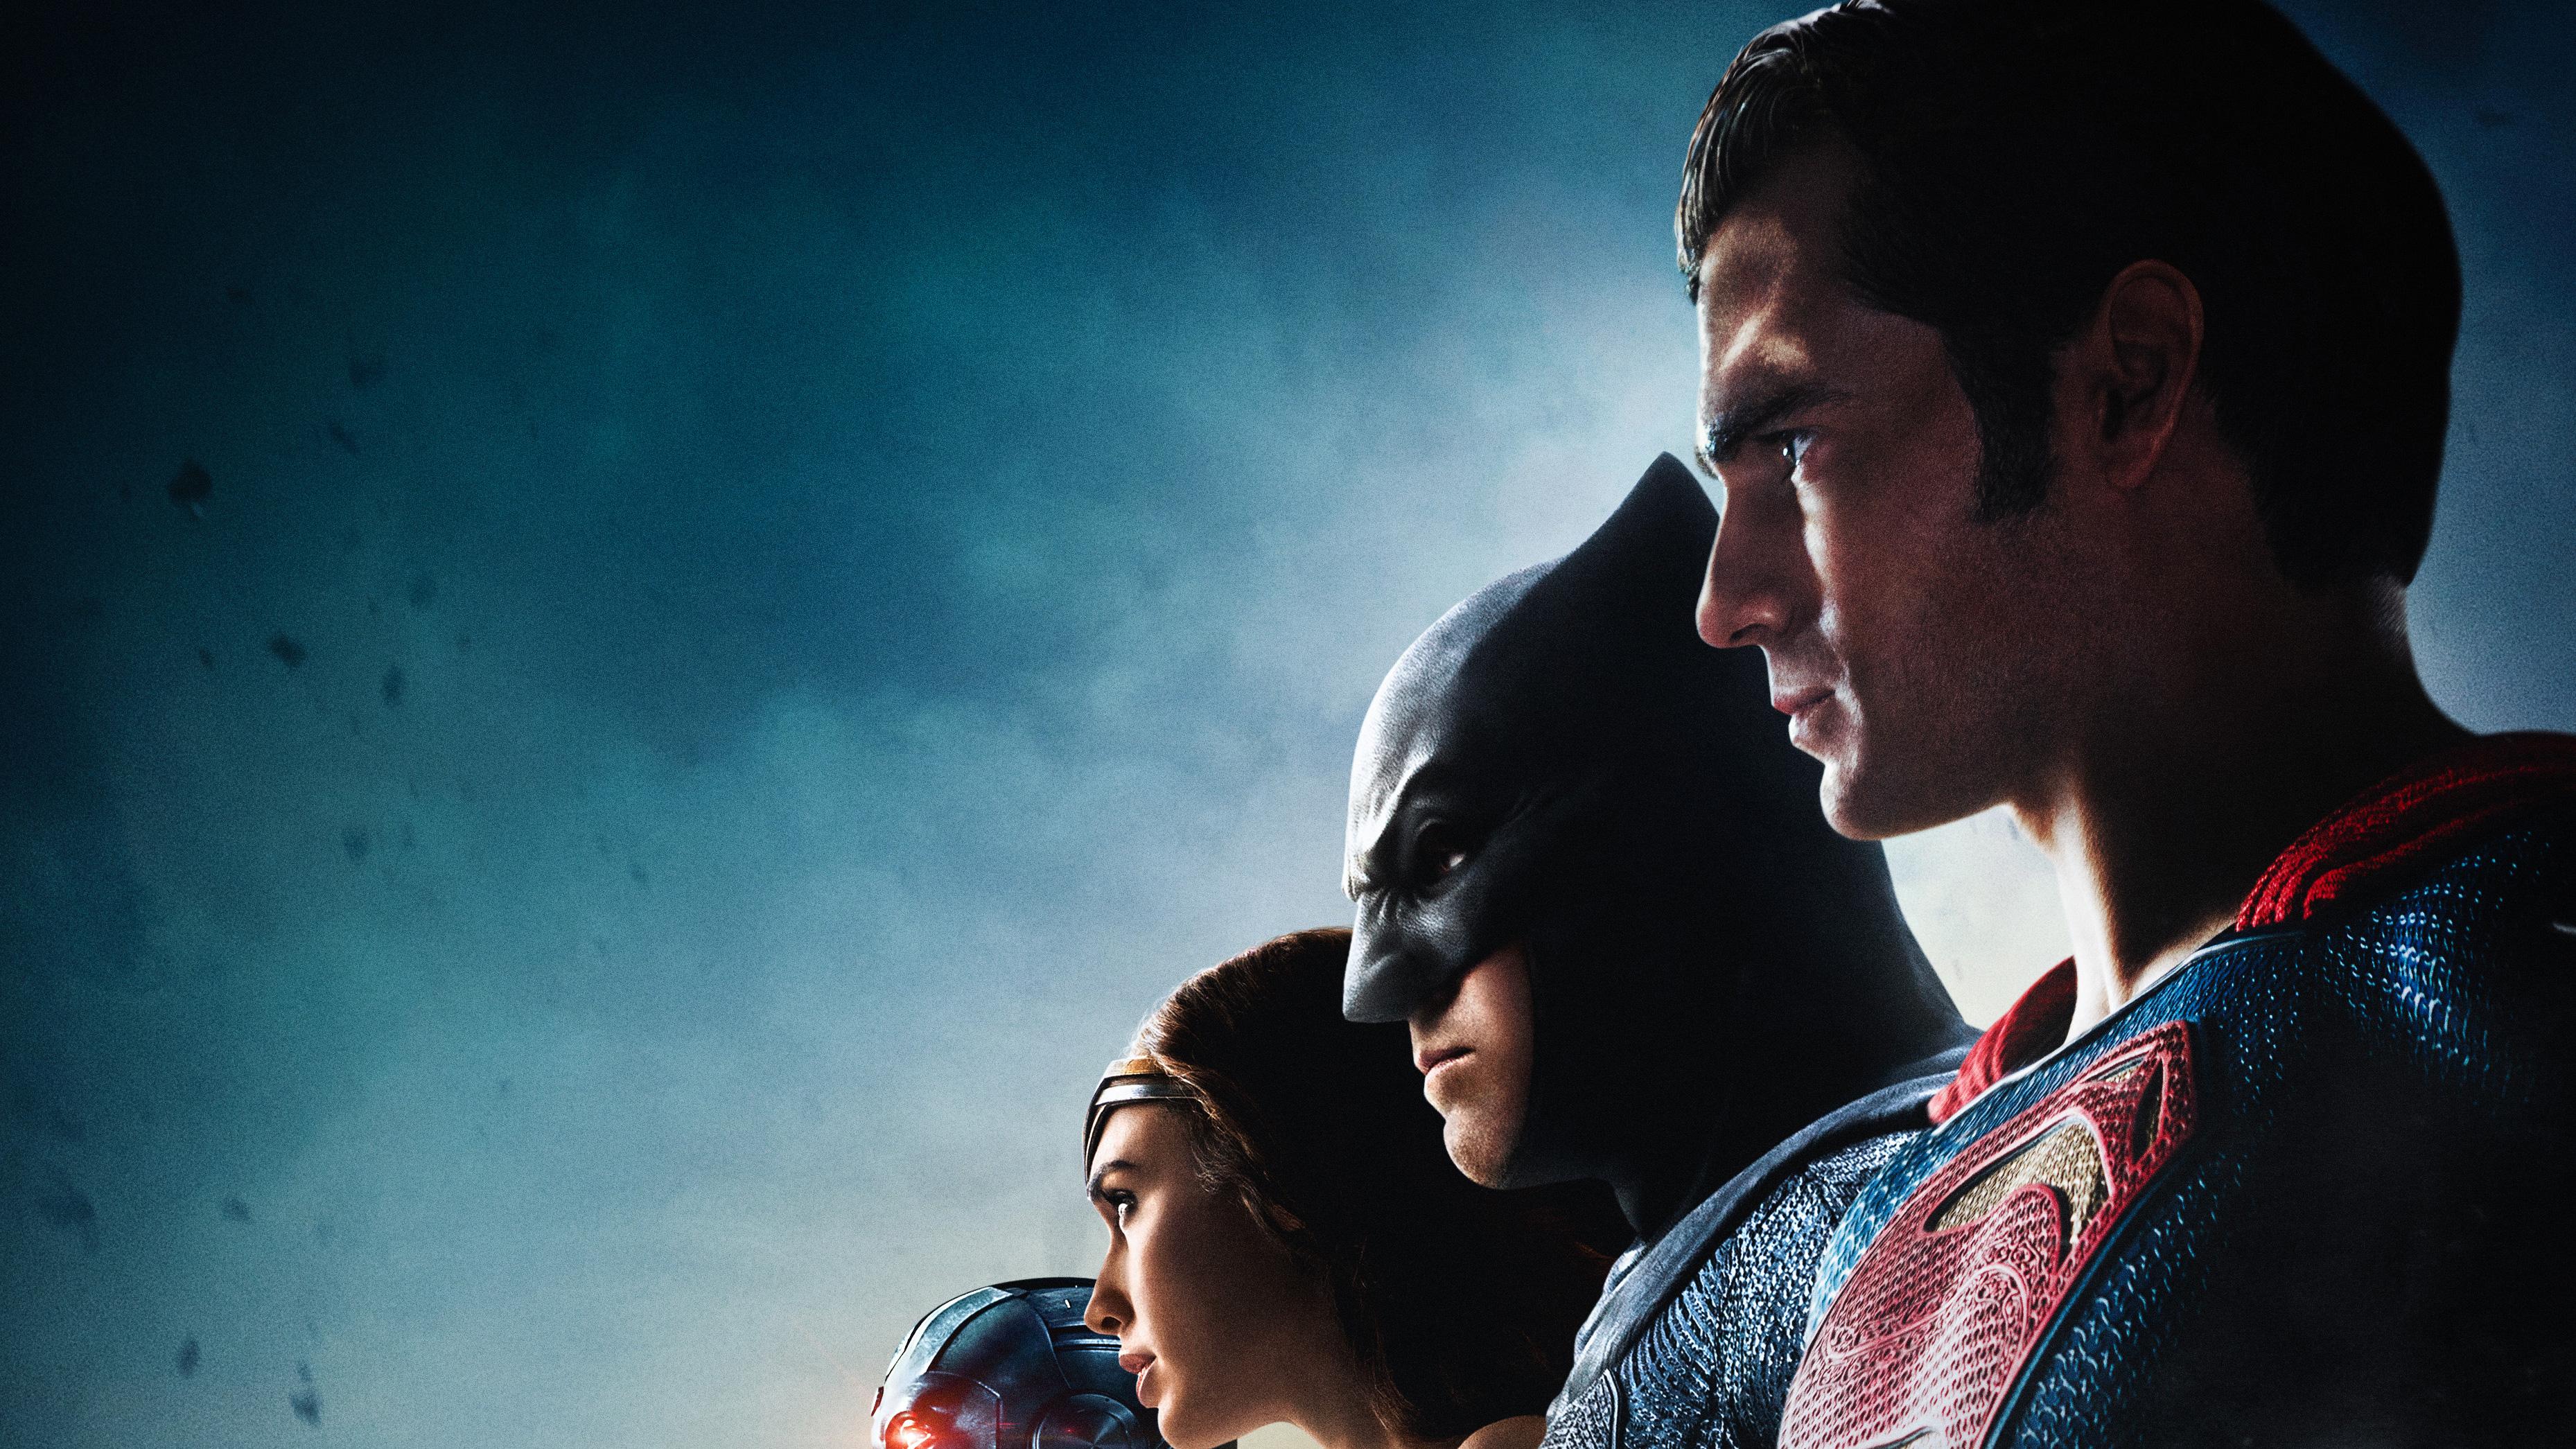 superman batman wonder woman justice league 4k, hd movies, 4k